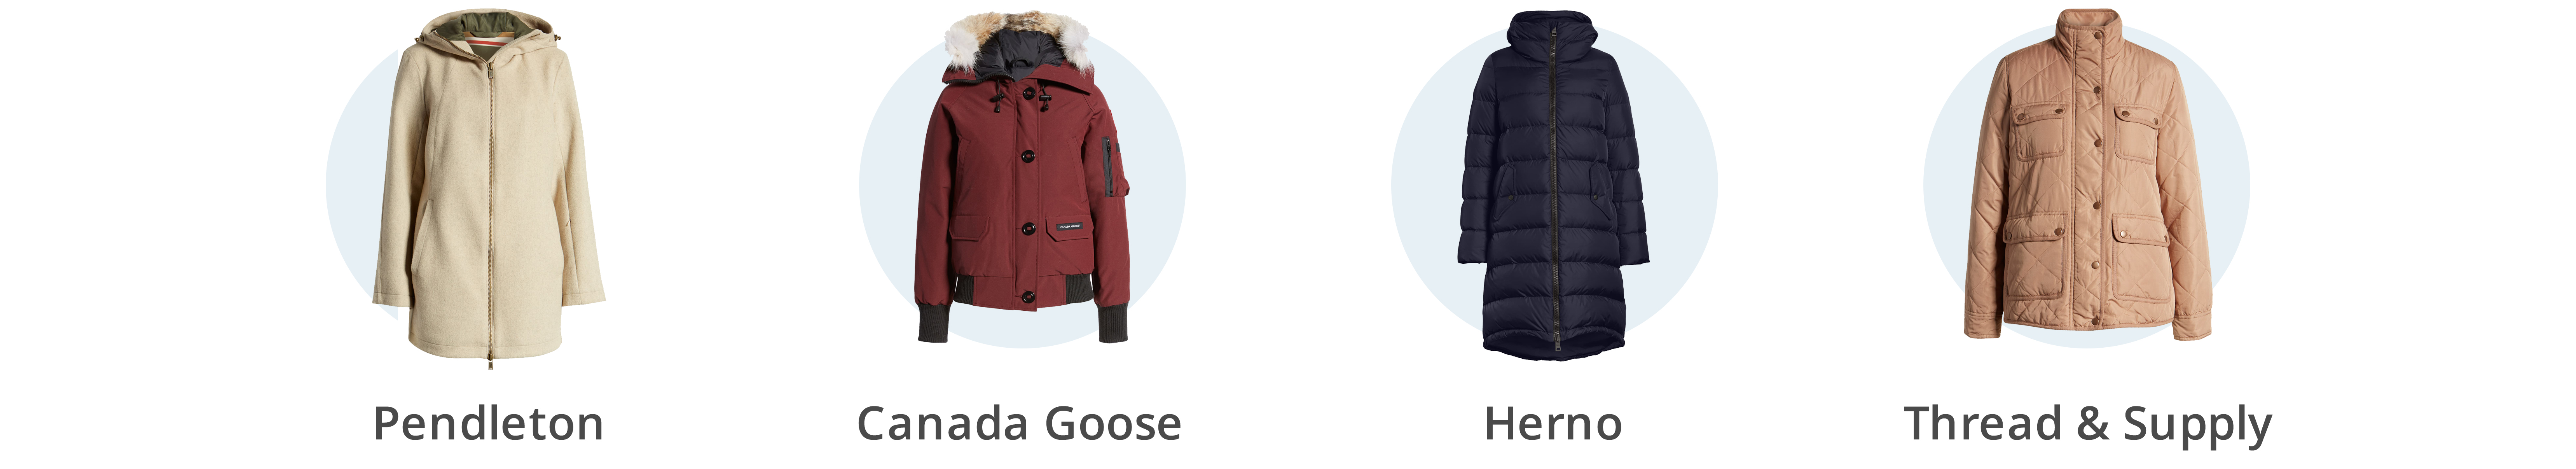 Women's heavy winter coats